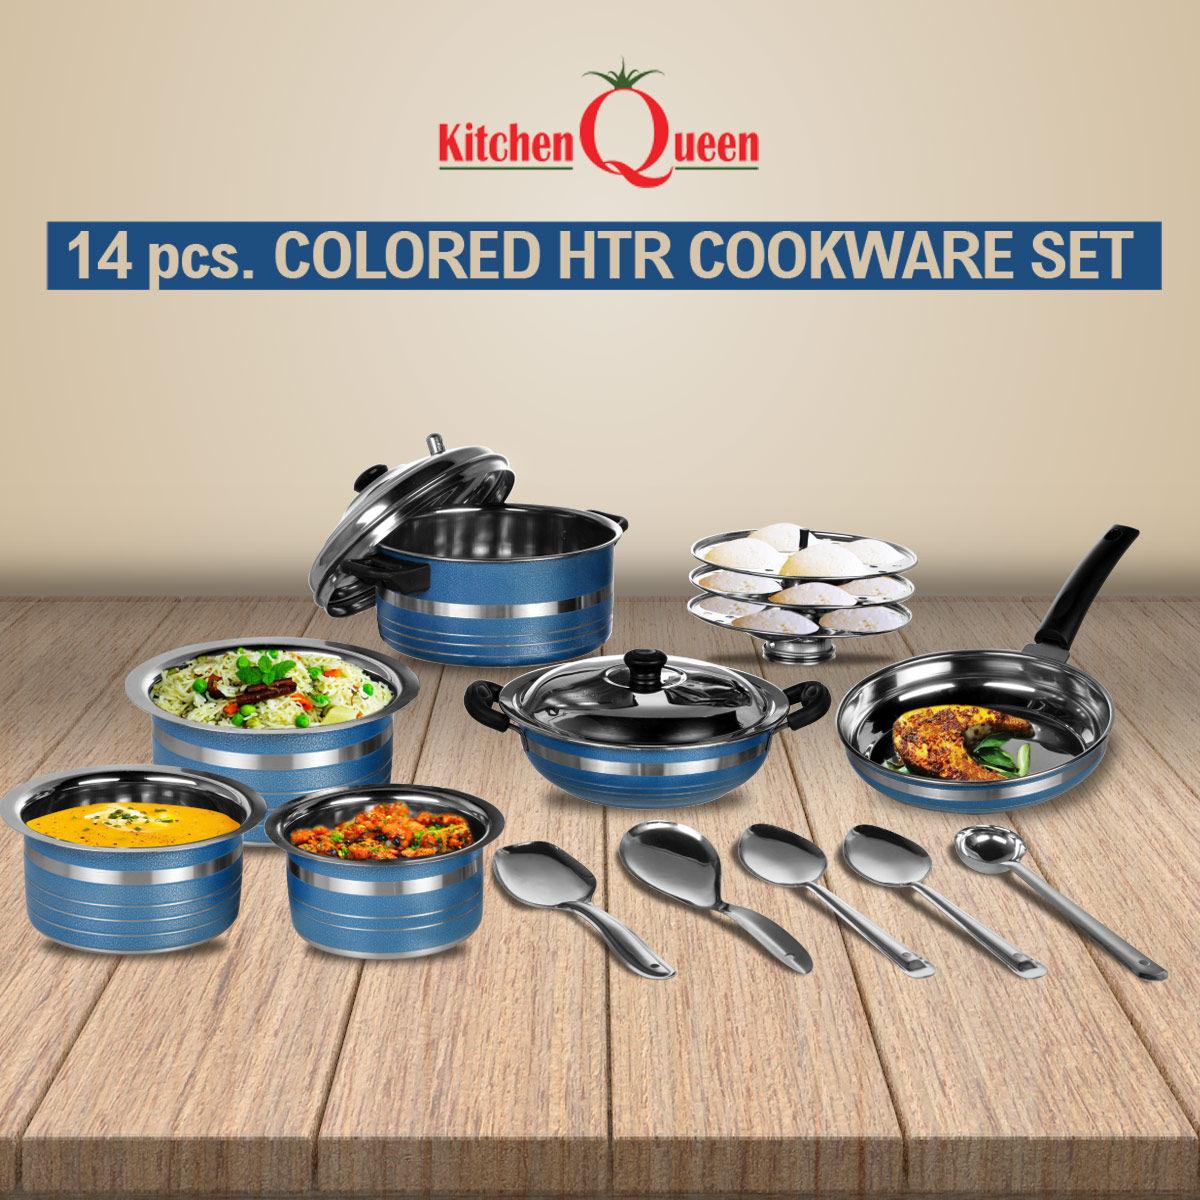 Naaptol Kitchen Set: Buy 14 Pcs Colored HTR Cookware Set Online At Best Price